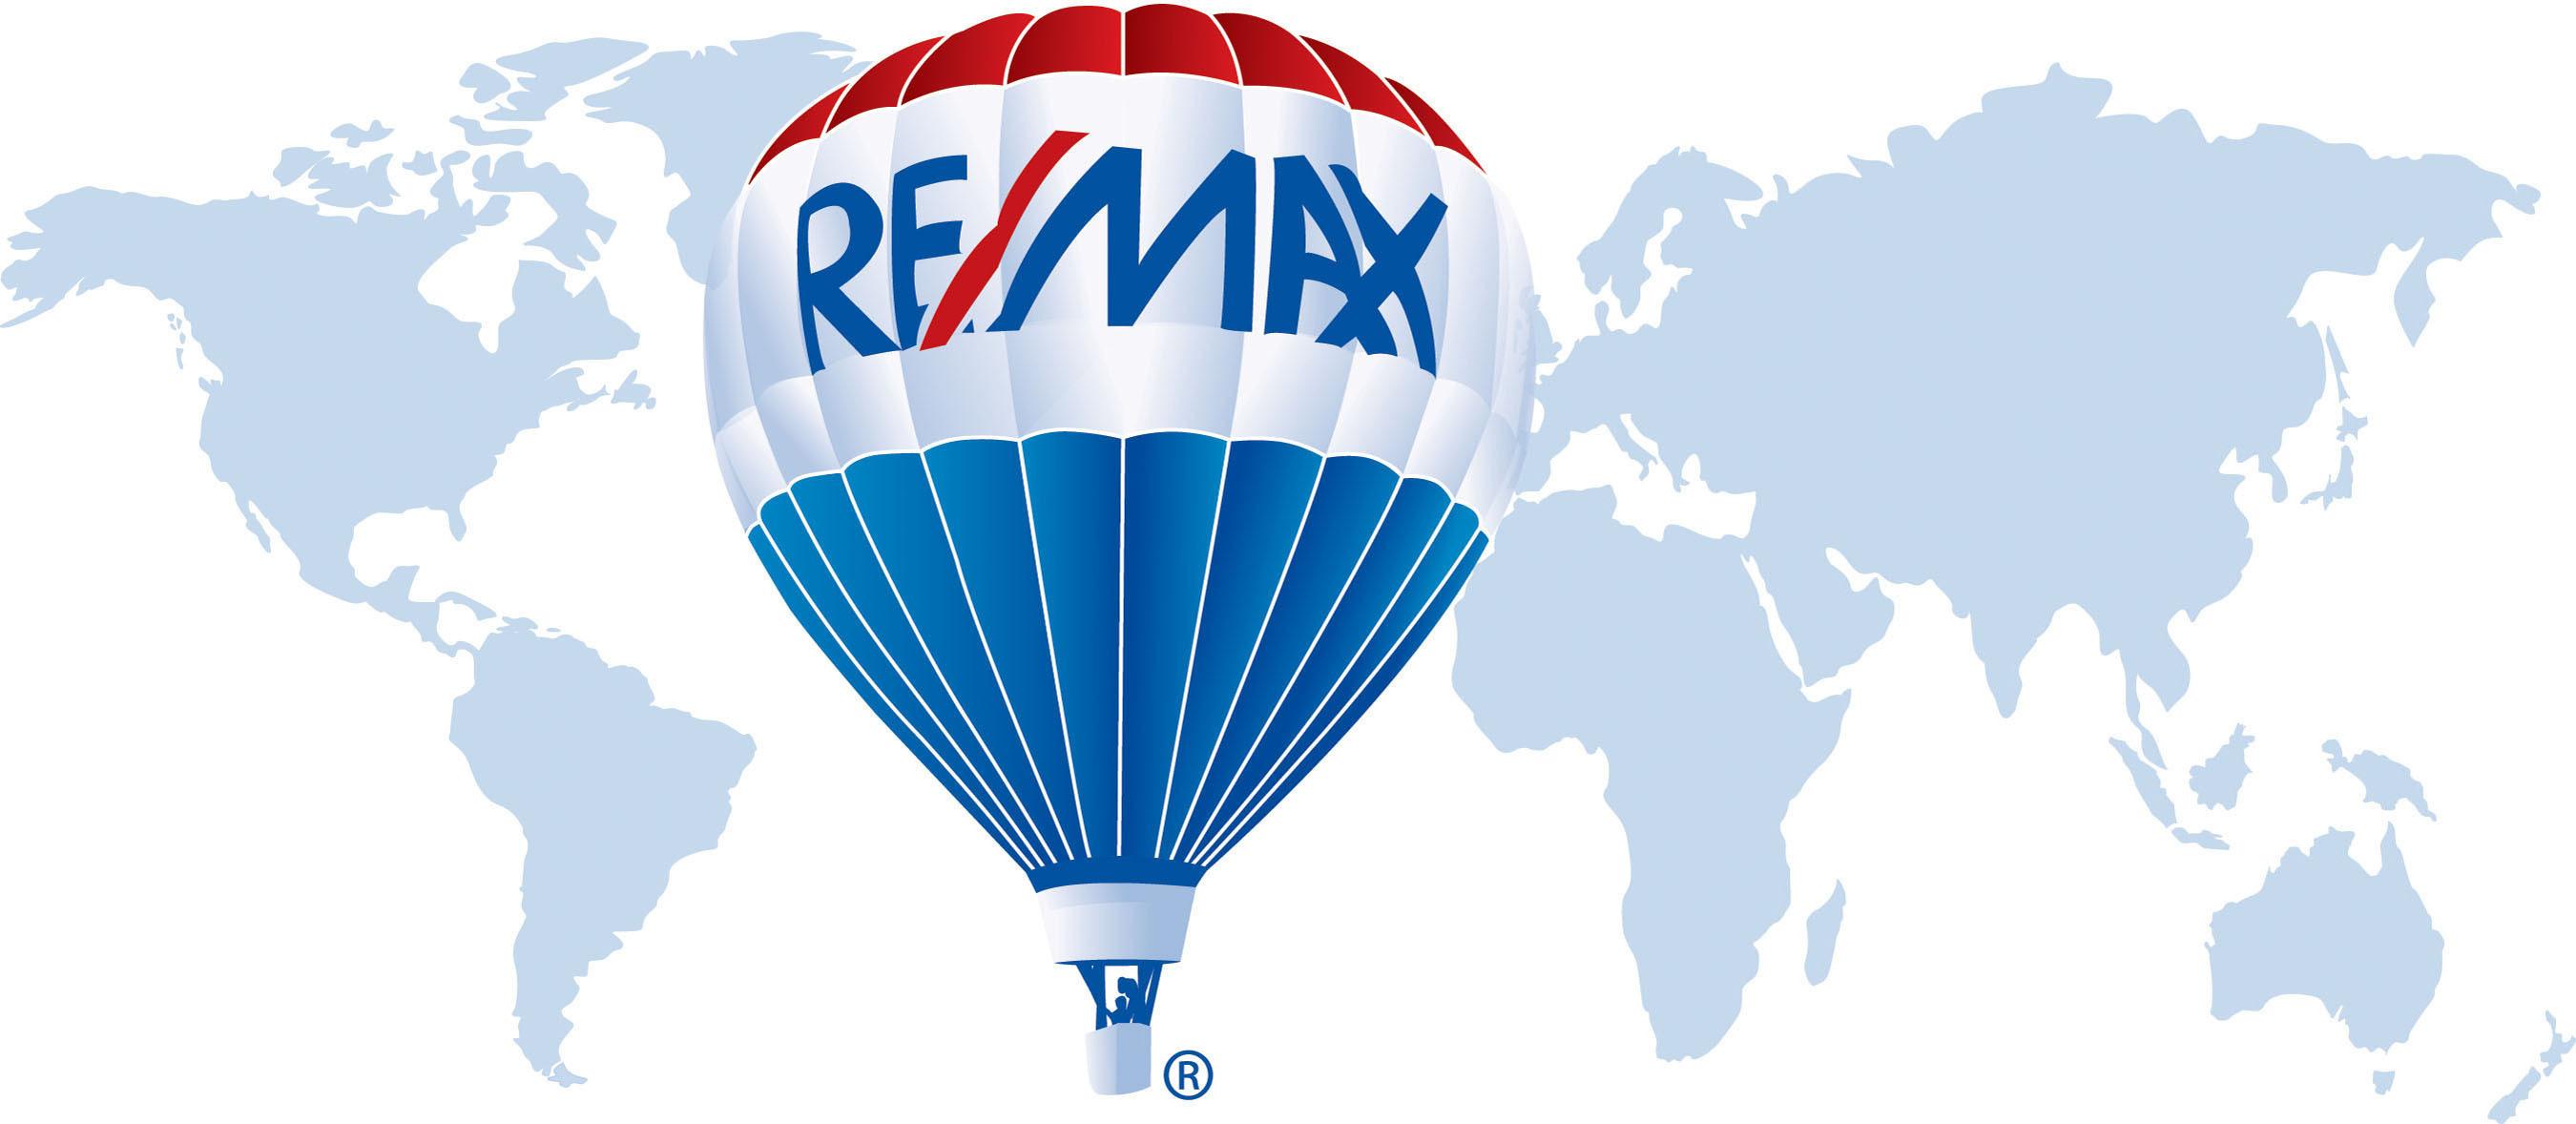 RE/MAX, LLC Logo. (PRNewsFoto/RE/MAX International, Inc.)